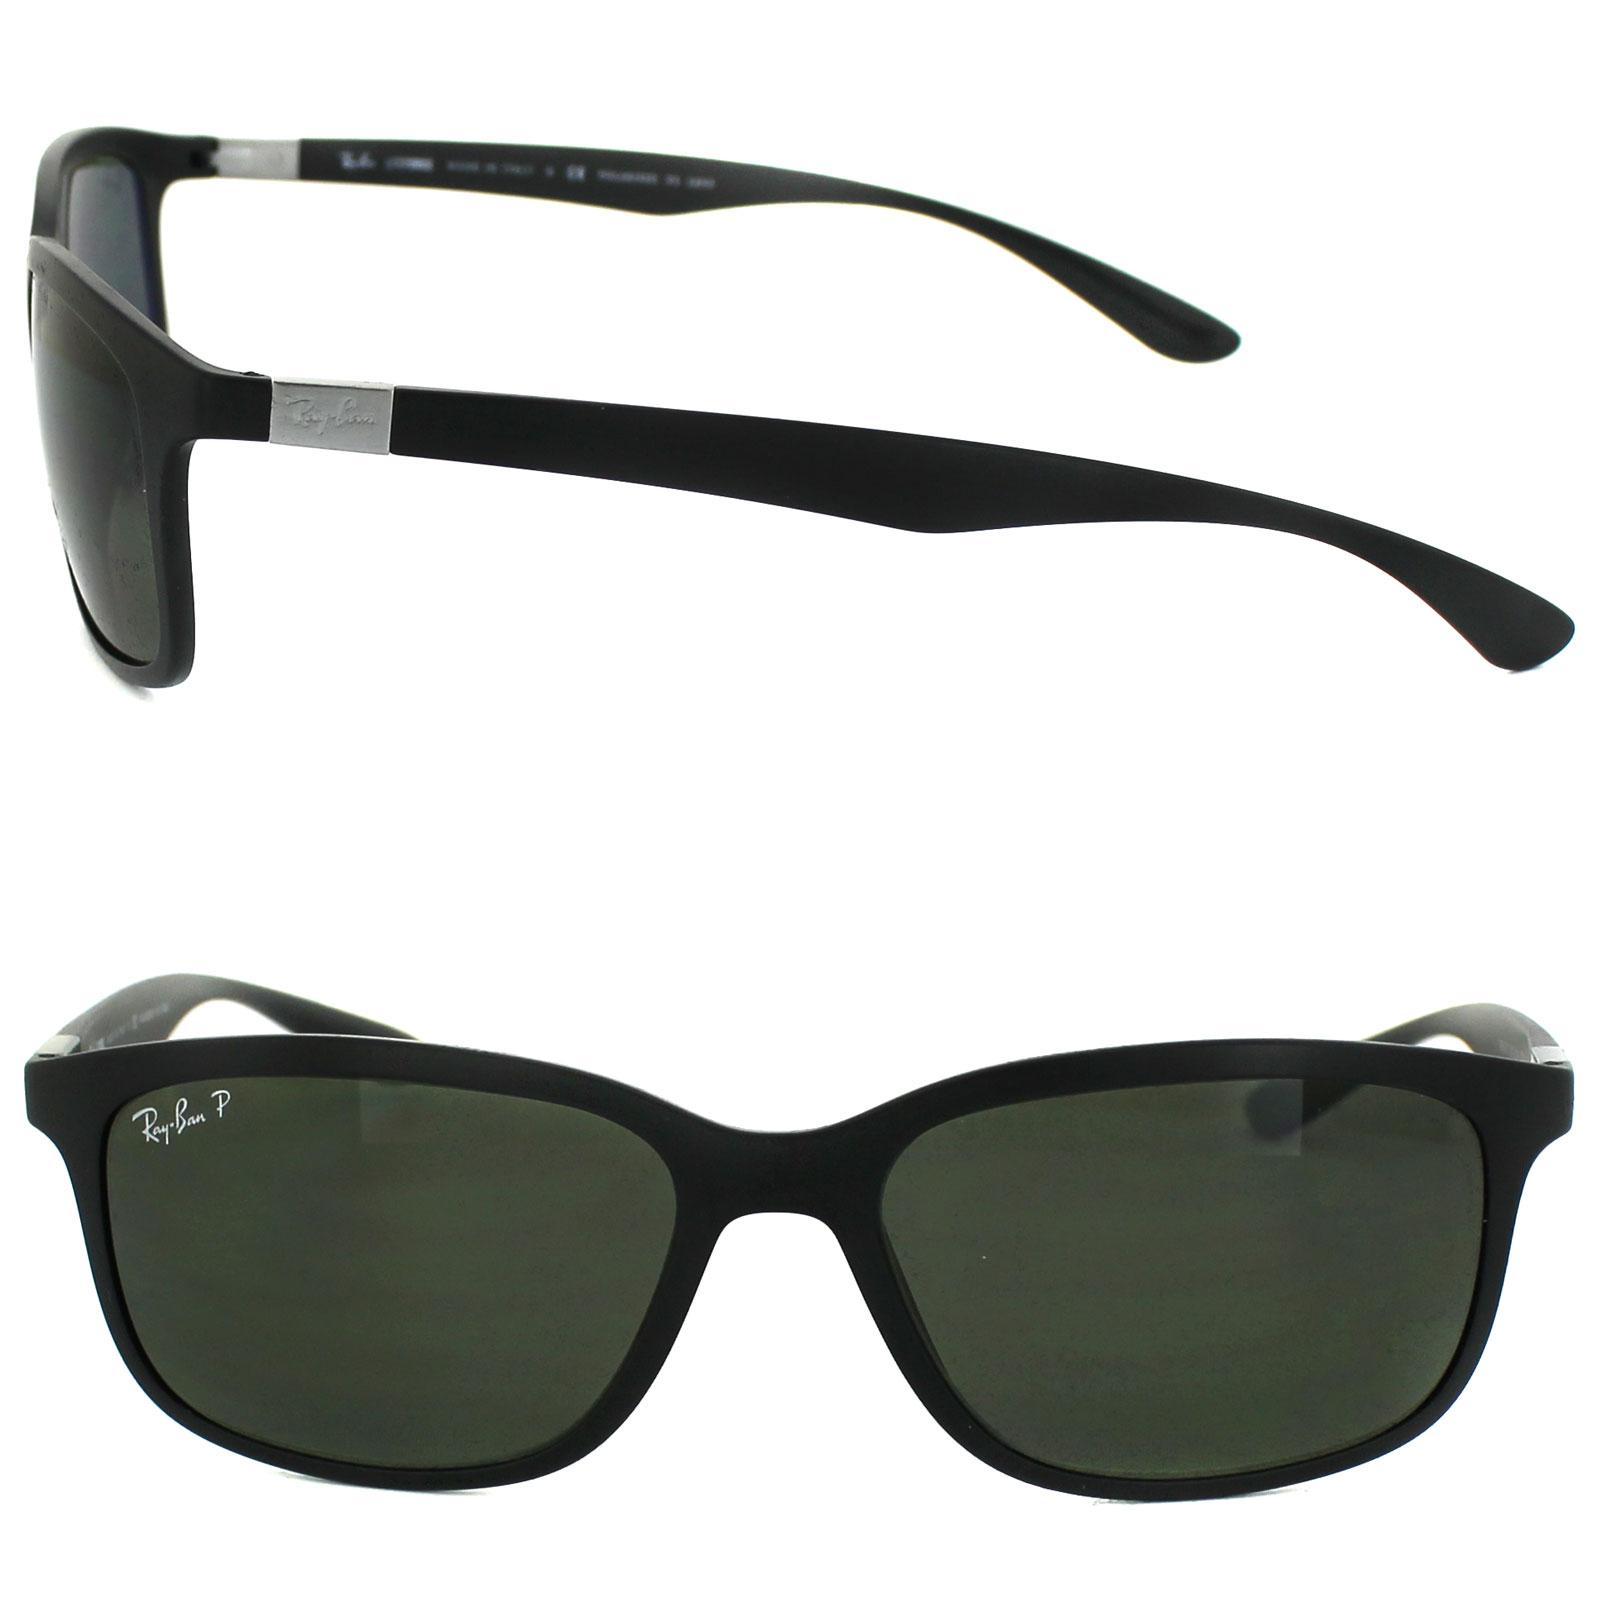 3d1c9c53673 Ray Ban Sunglasses Wayfair Price Protection Policy « Heritage Malta